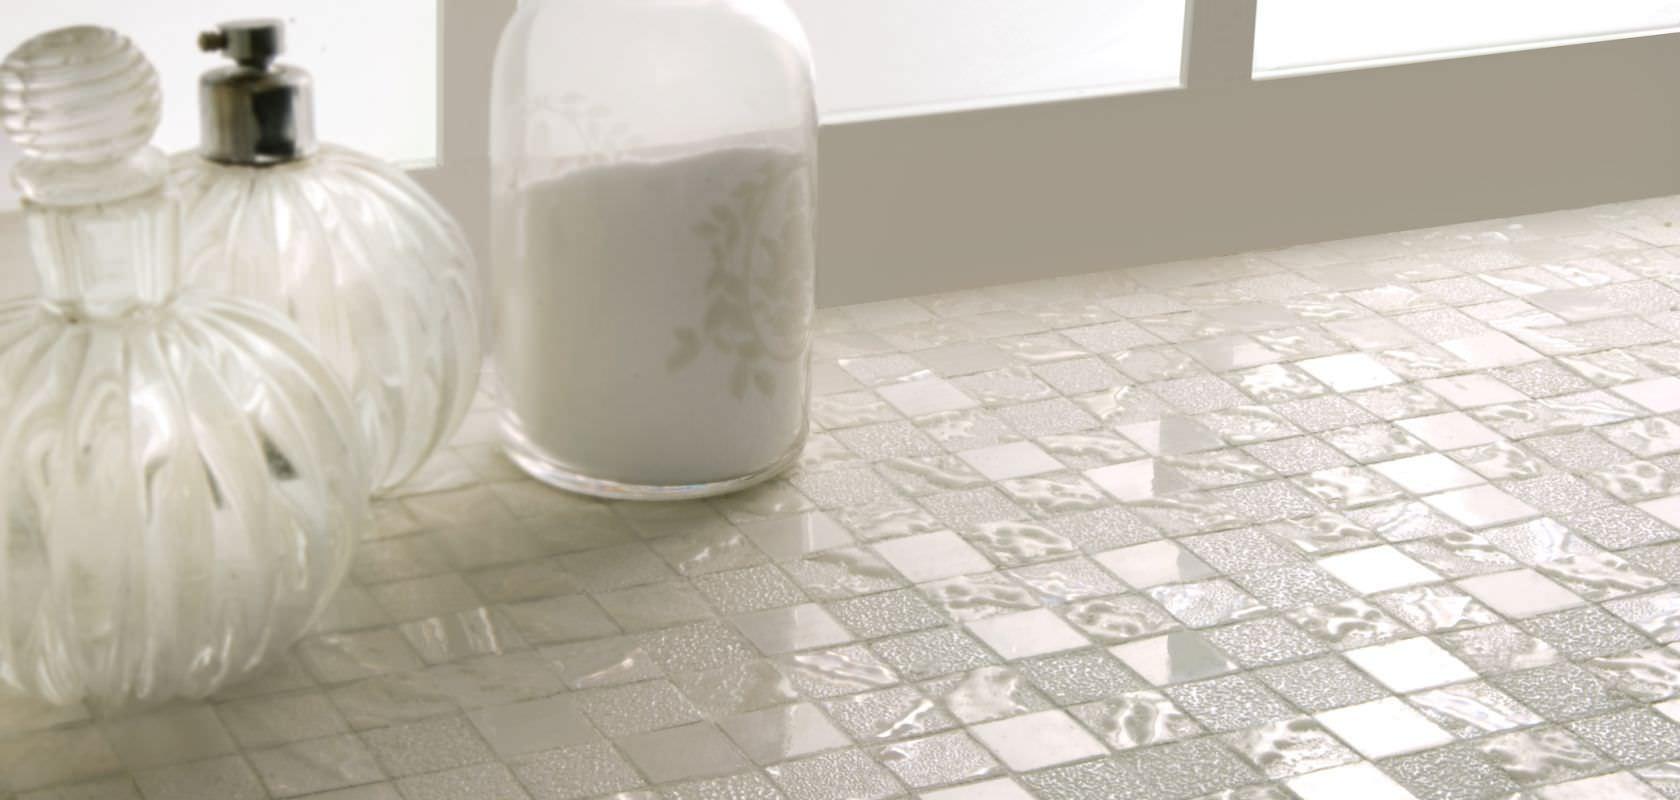 Indoor mosaic tile bathroom floor porcelain stoneware four indoor mosaic tile bathroom floor porcelain stoneware four seasons snow one ceramiche dailygadgetfo Image collections